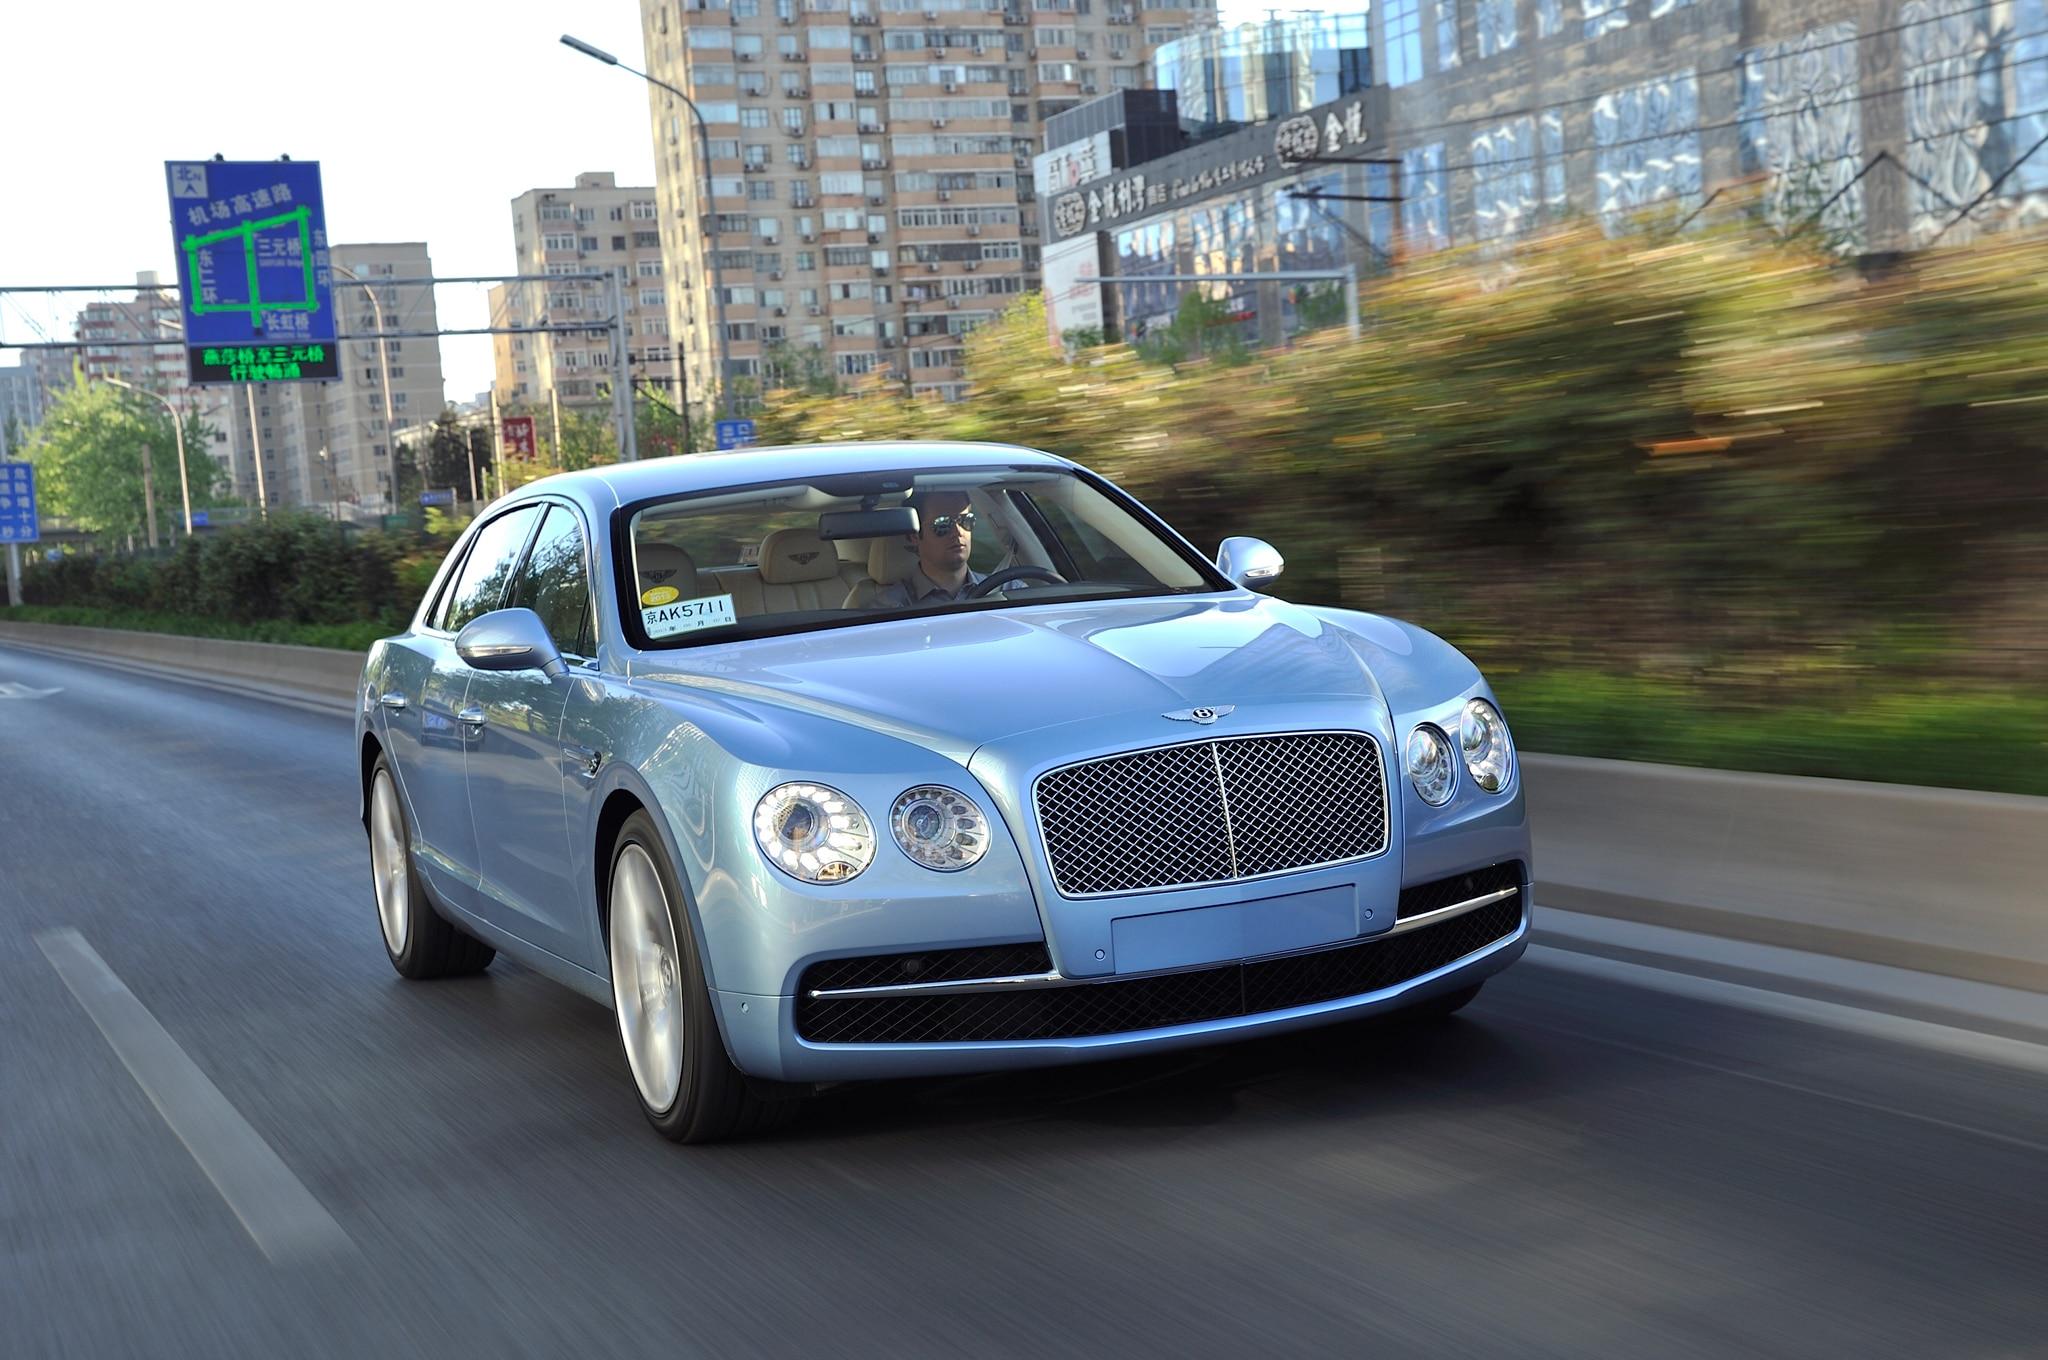 First Look: 2014 Bentley Flying Spur